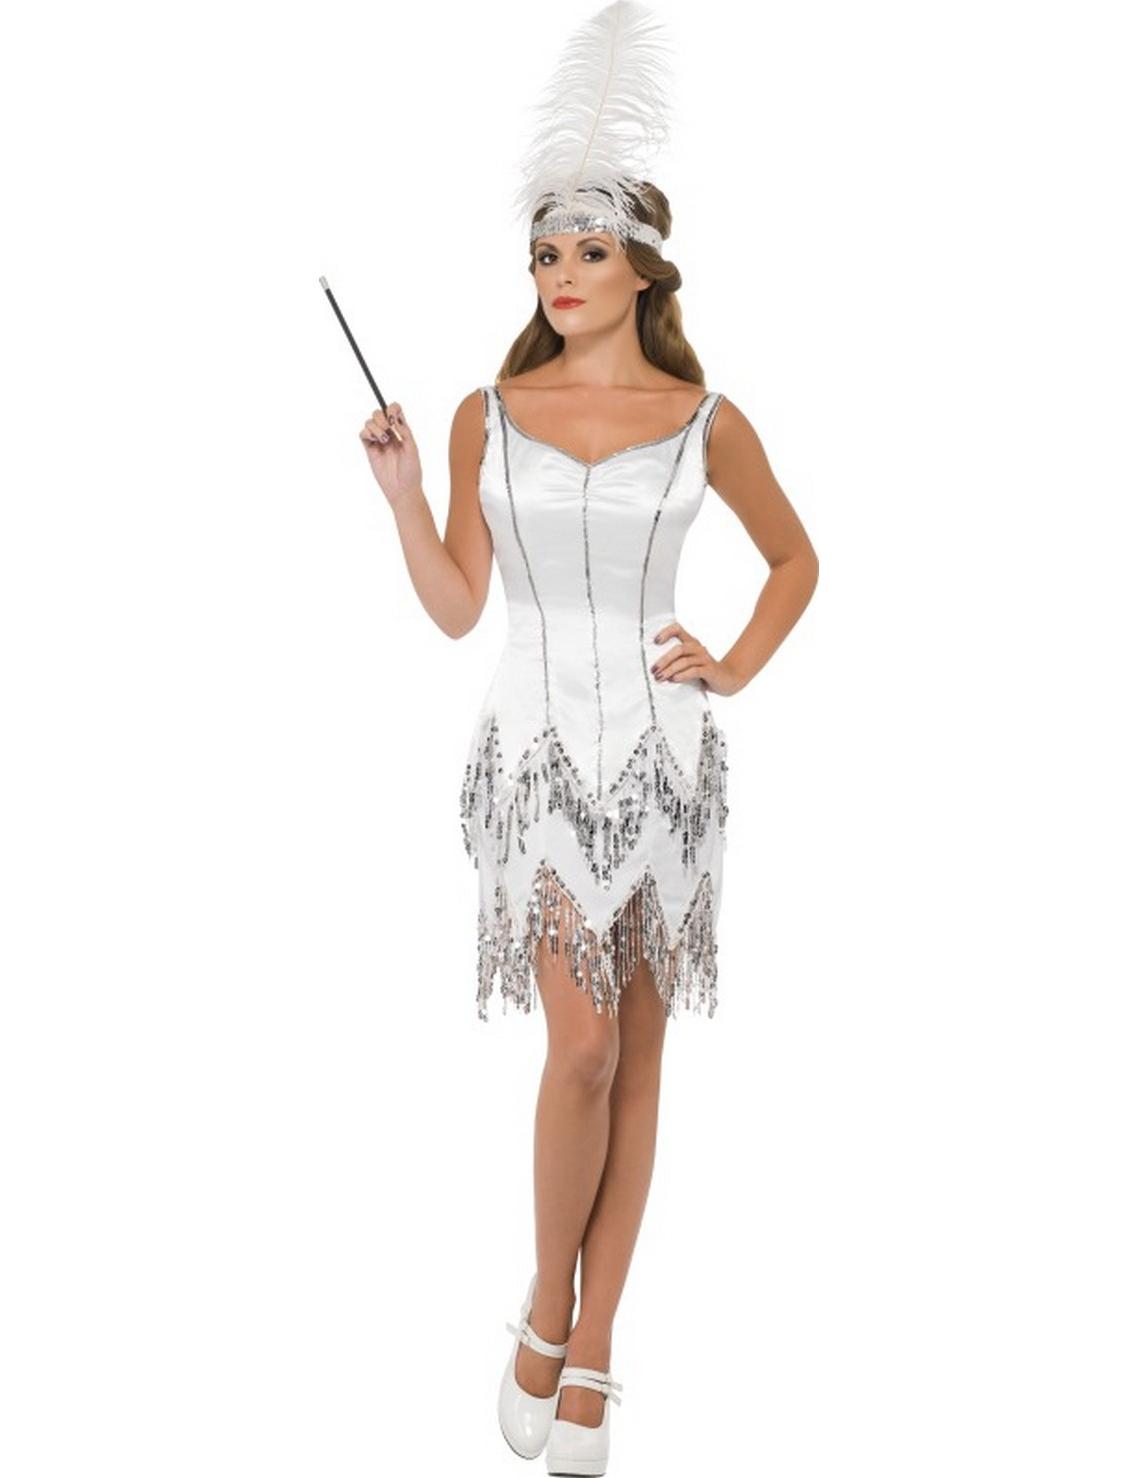 c4825f772 23871-vestido-charleston-de-fiesta-4 1 zoom vestido charleston blanco